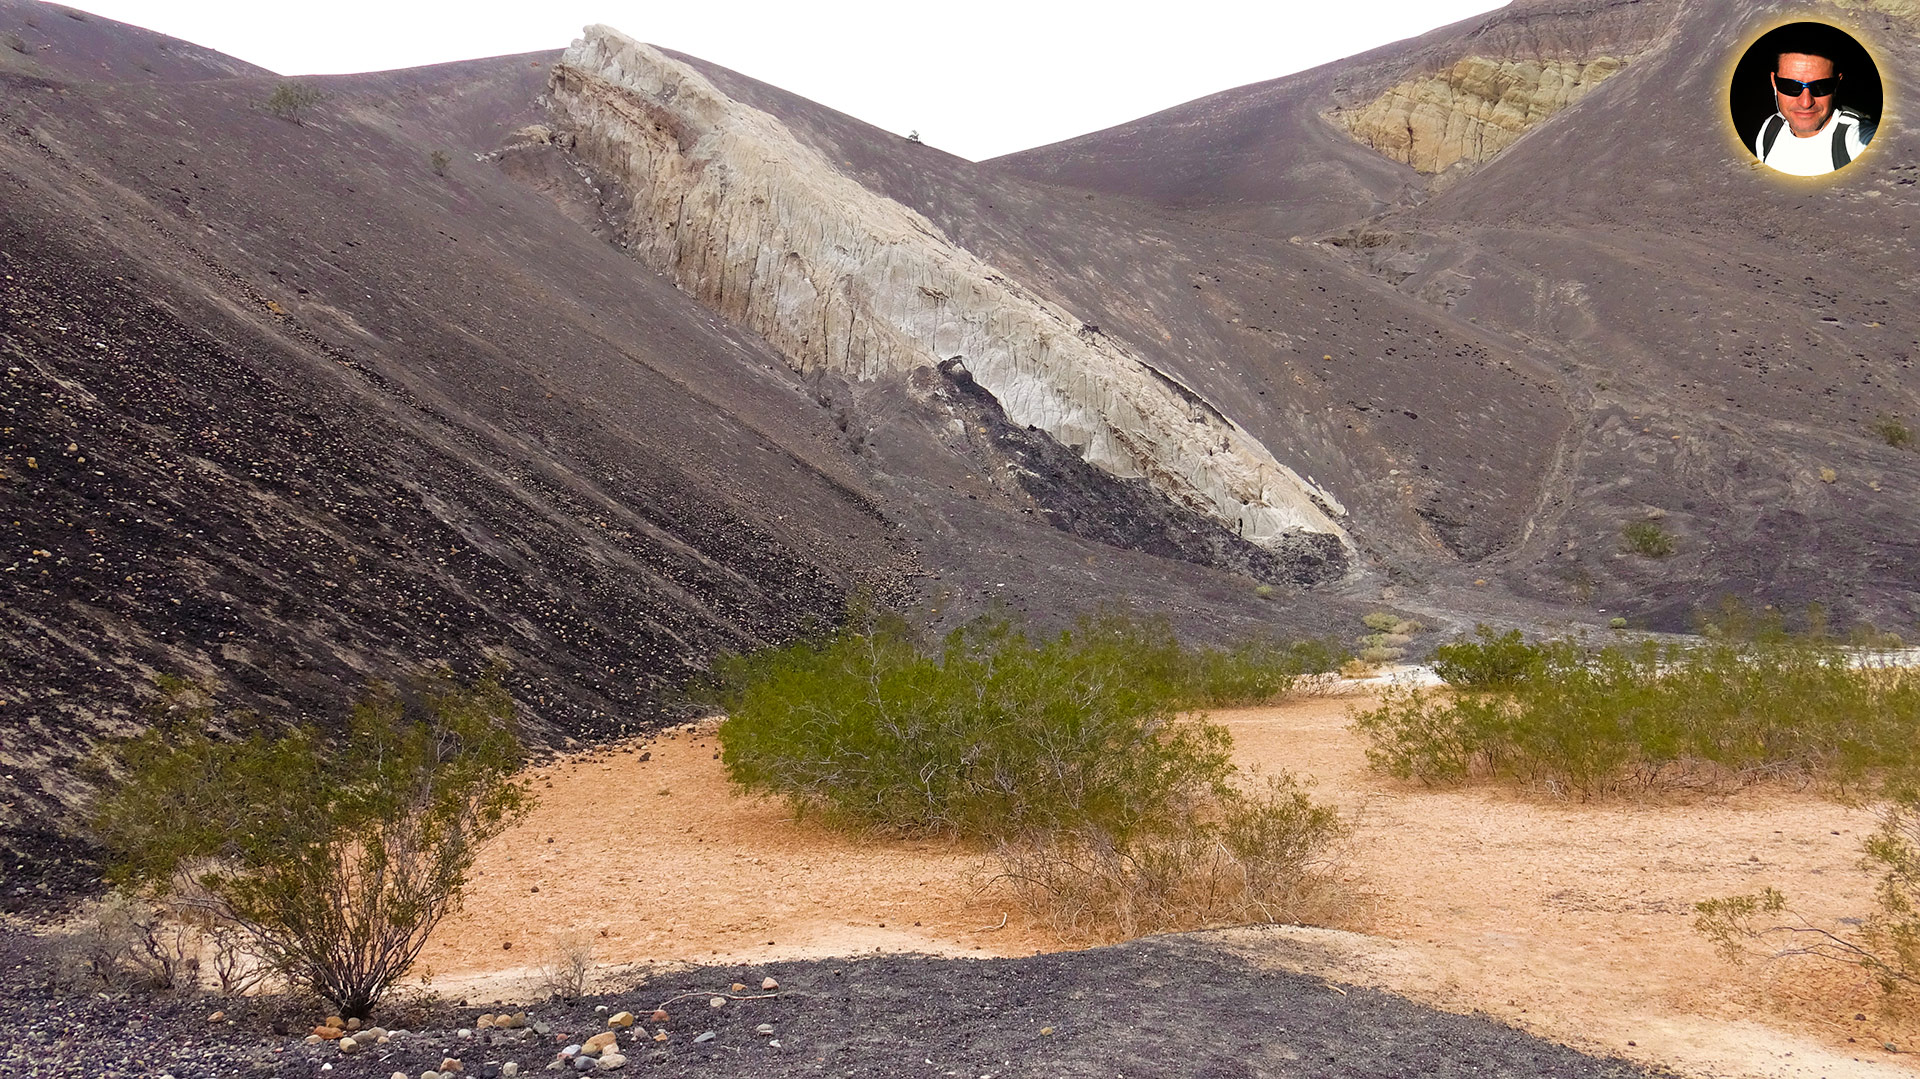 death valley national park ubehebe crater22 - Ubehebe, Cratera Multicolorida em Death Valley